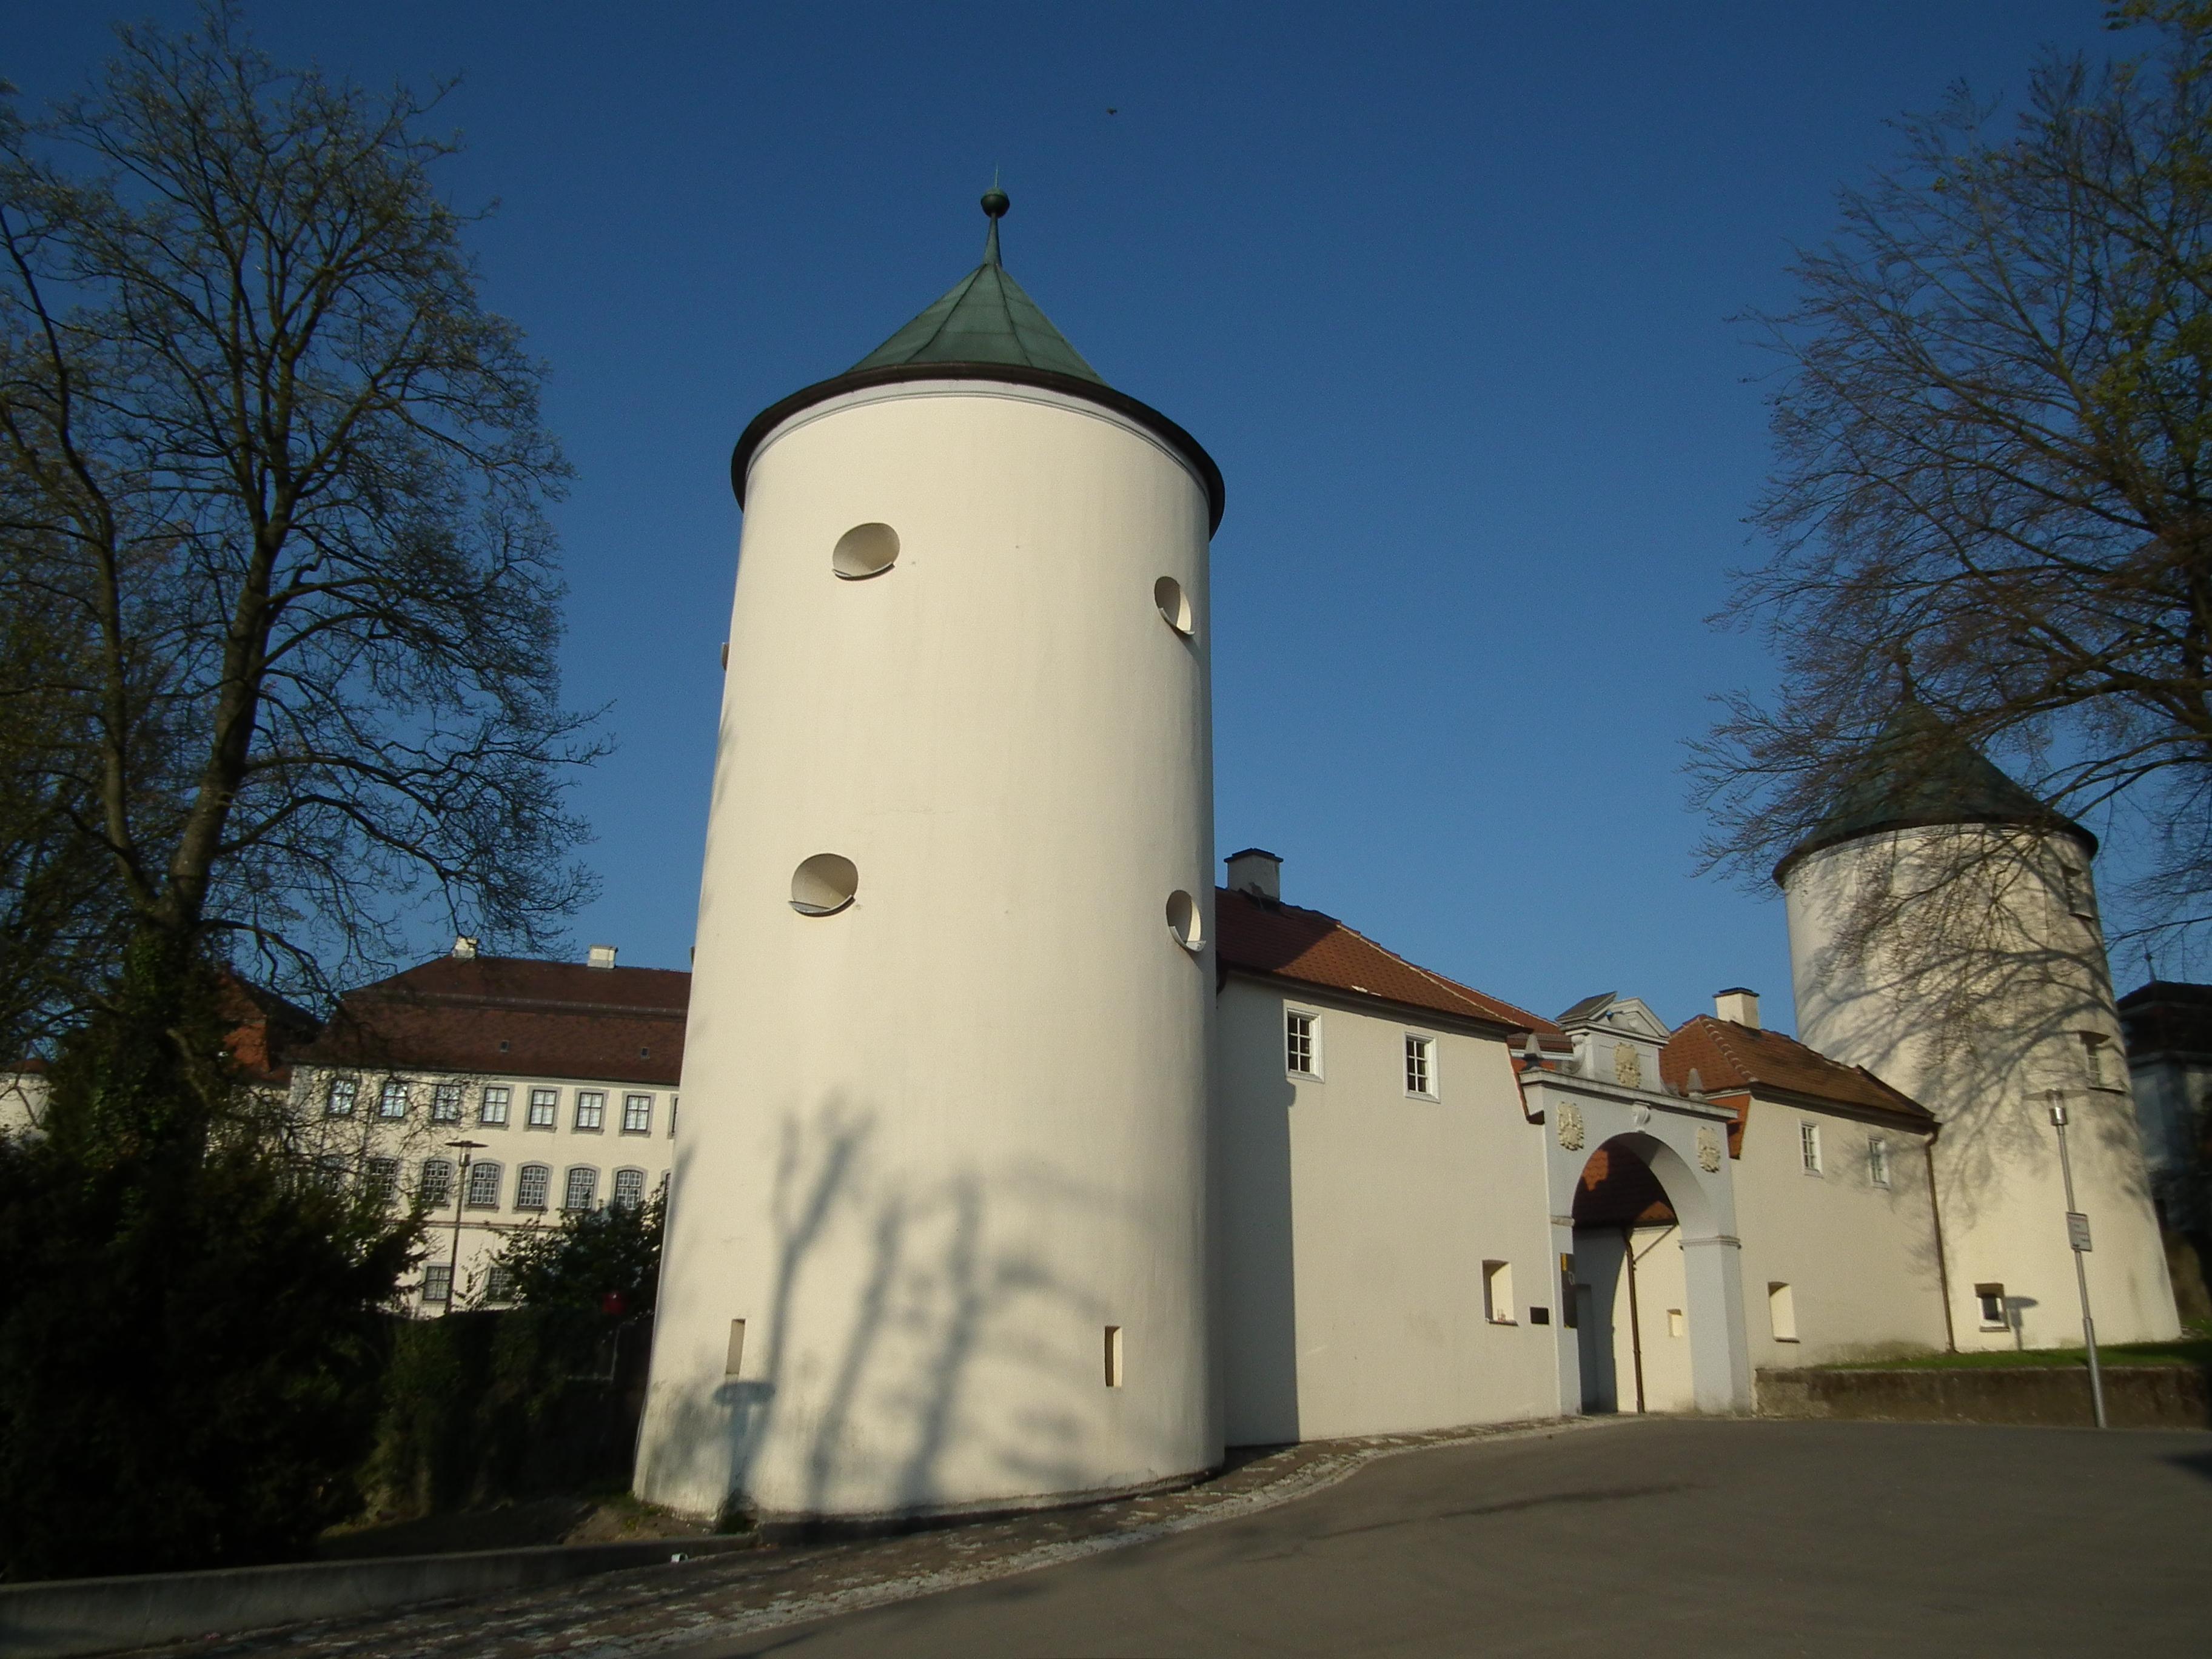 File:Wehrtürme Zugang Schloß Großlaupheim.JPG.